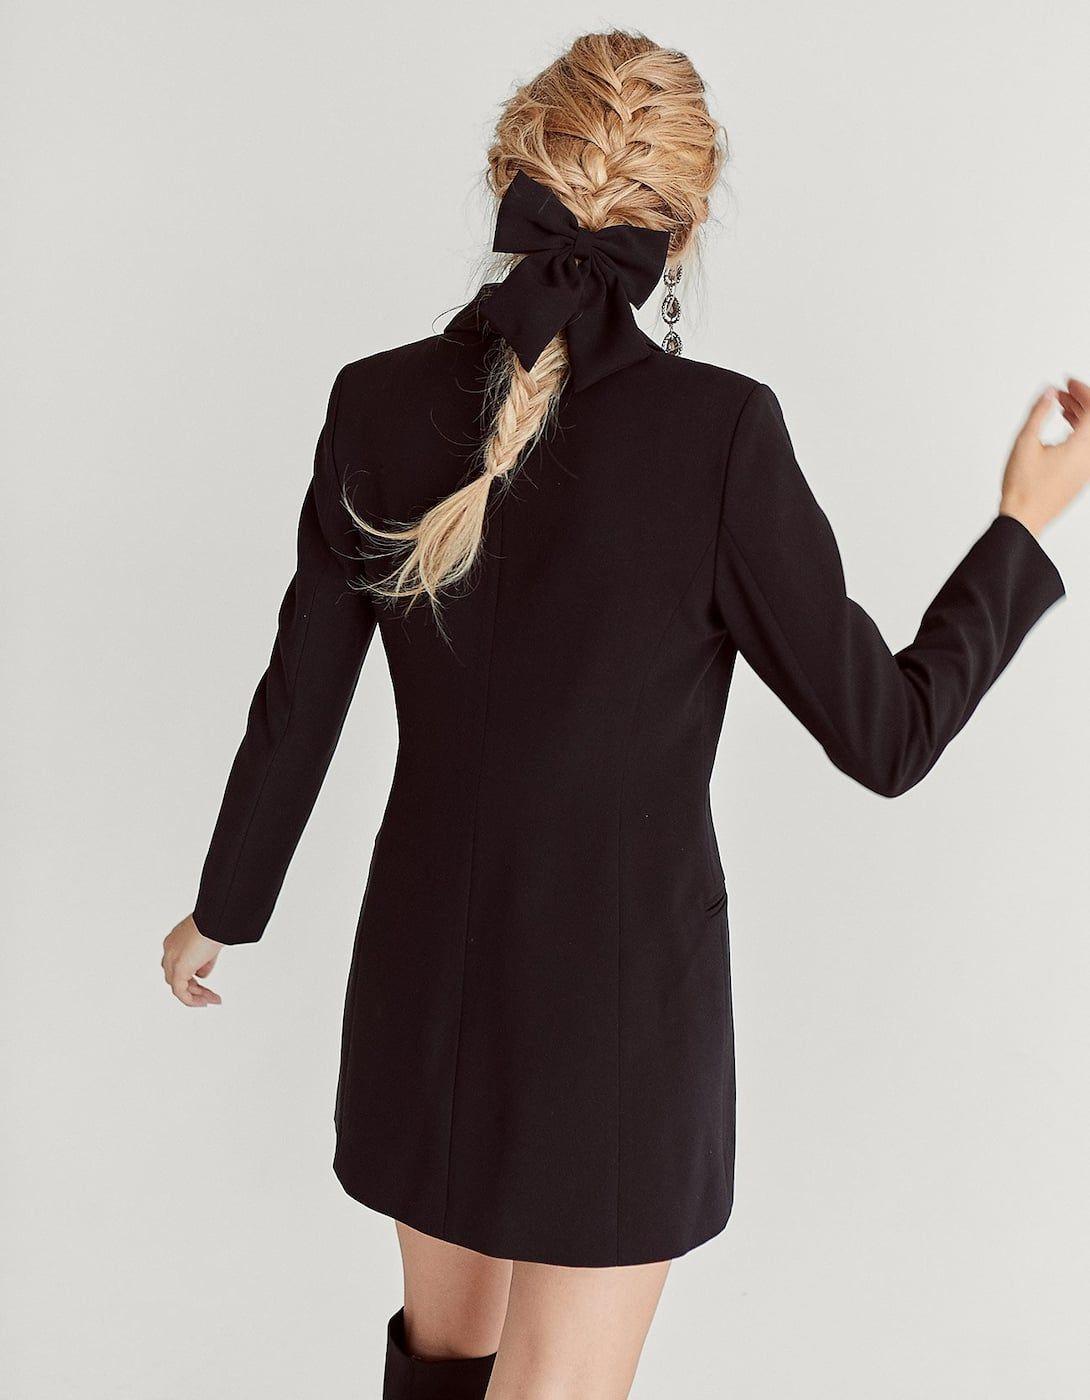 0cebb1b9dbe0 Blazer dress - Endless nights